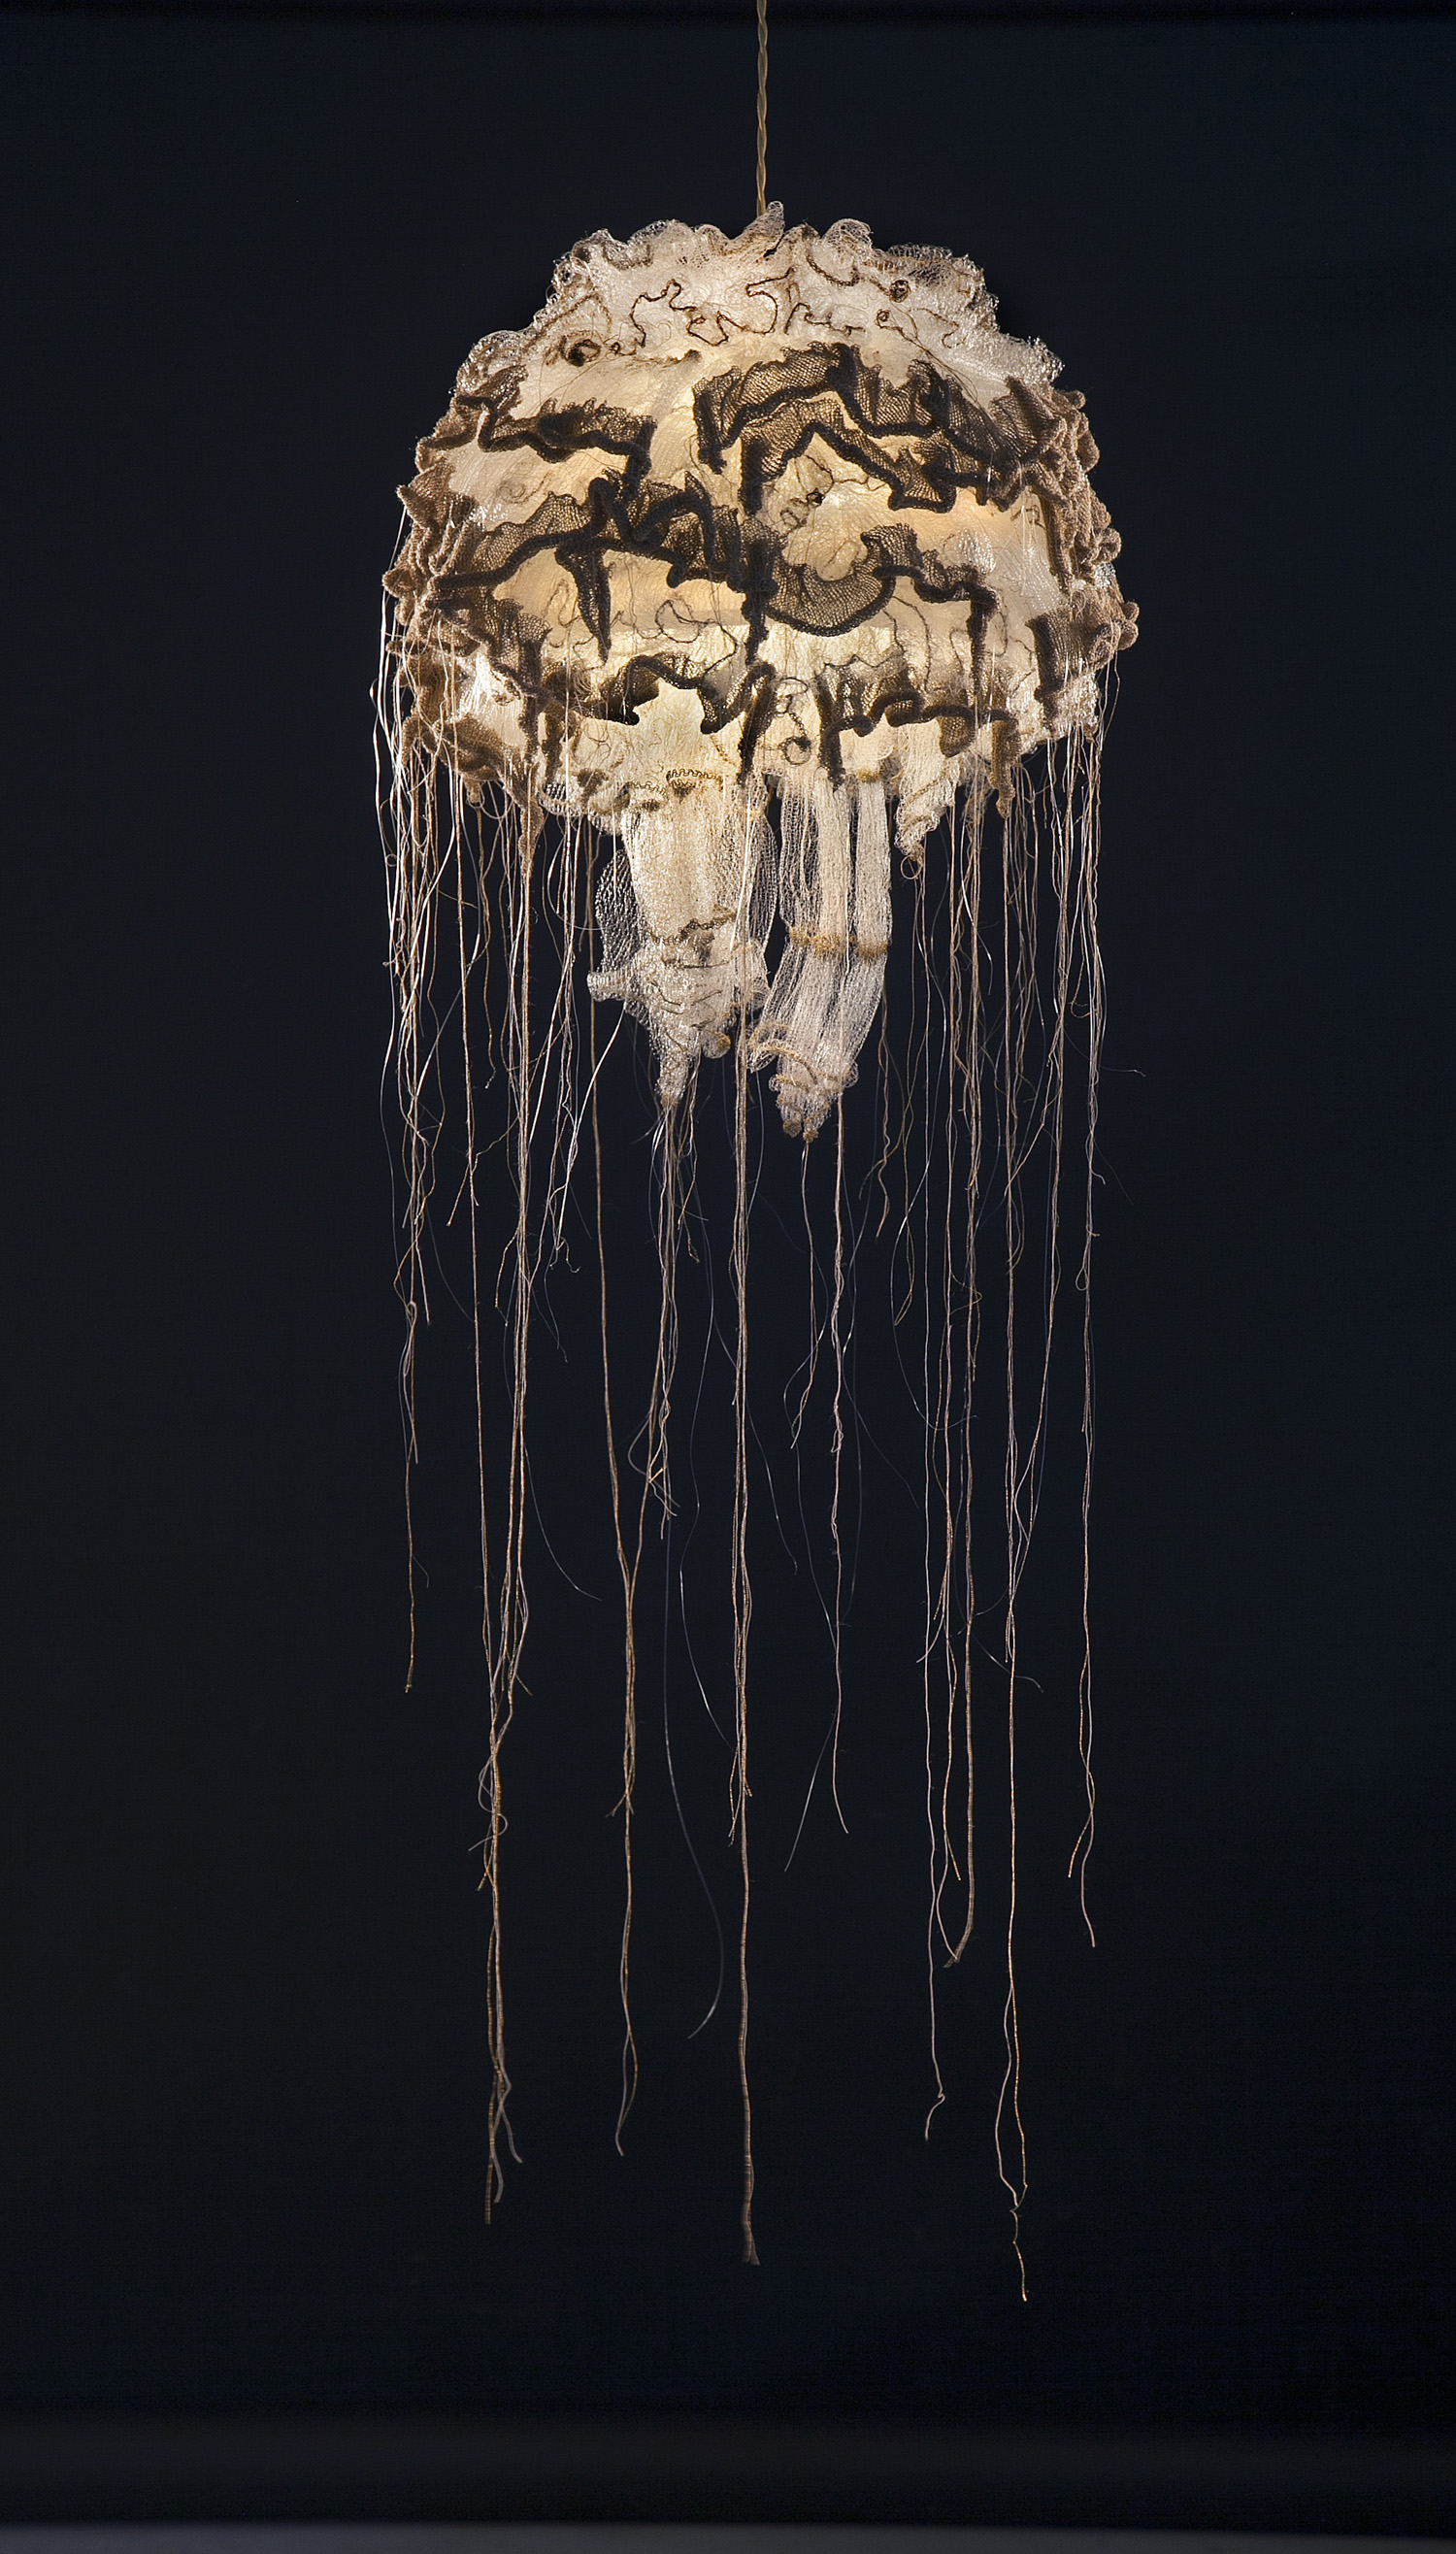 mariannejohnstad_jellyfishlamp_big.jpg